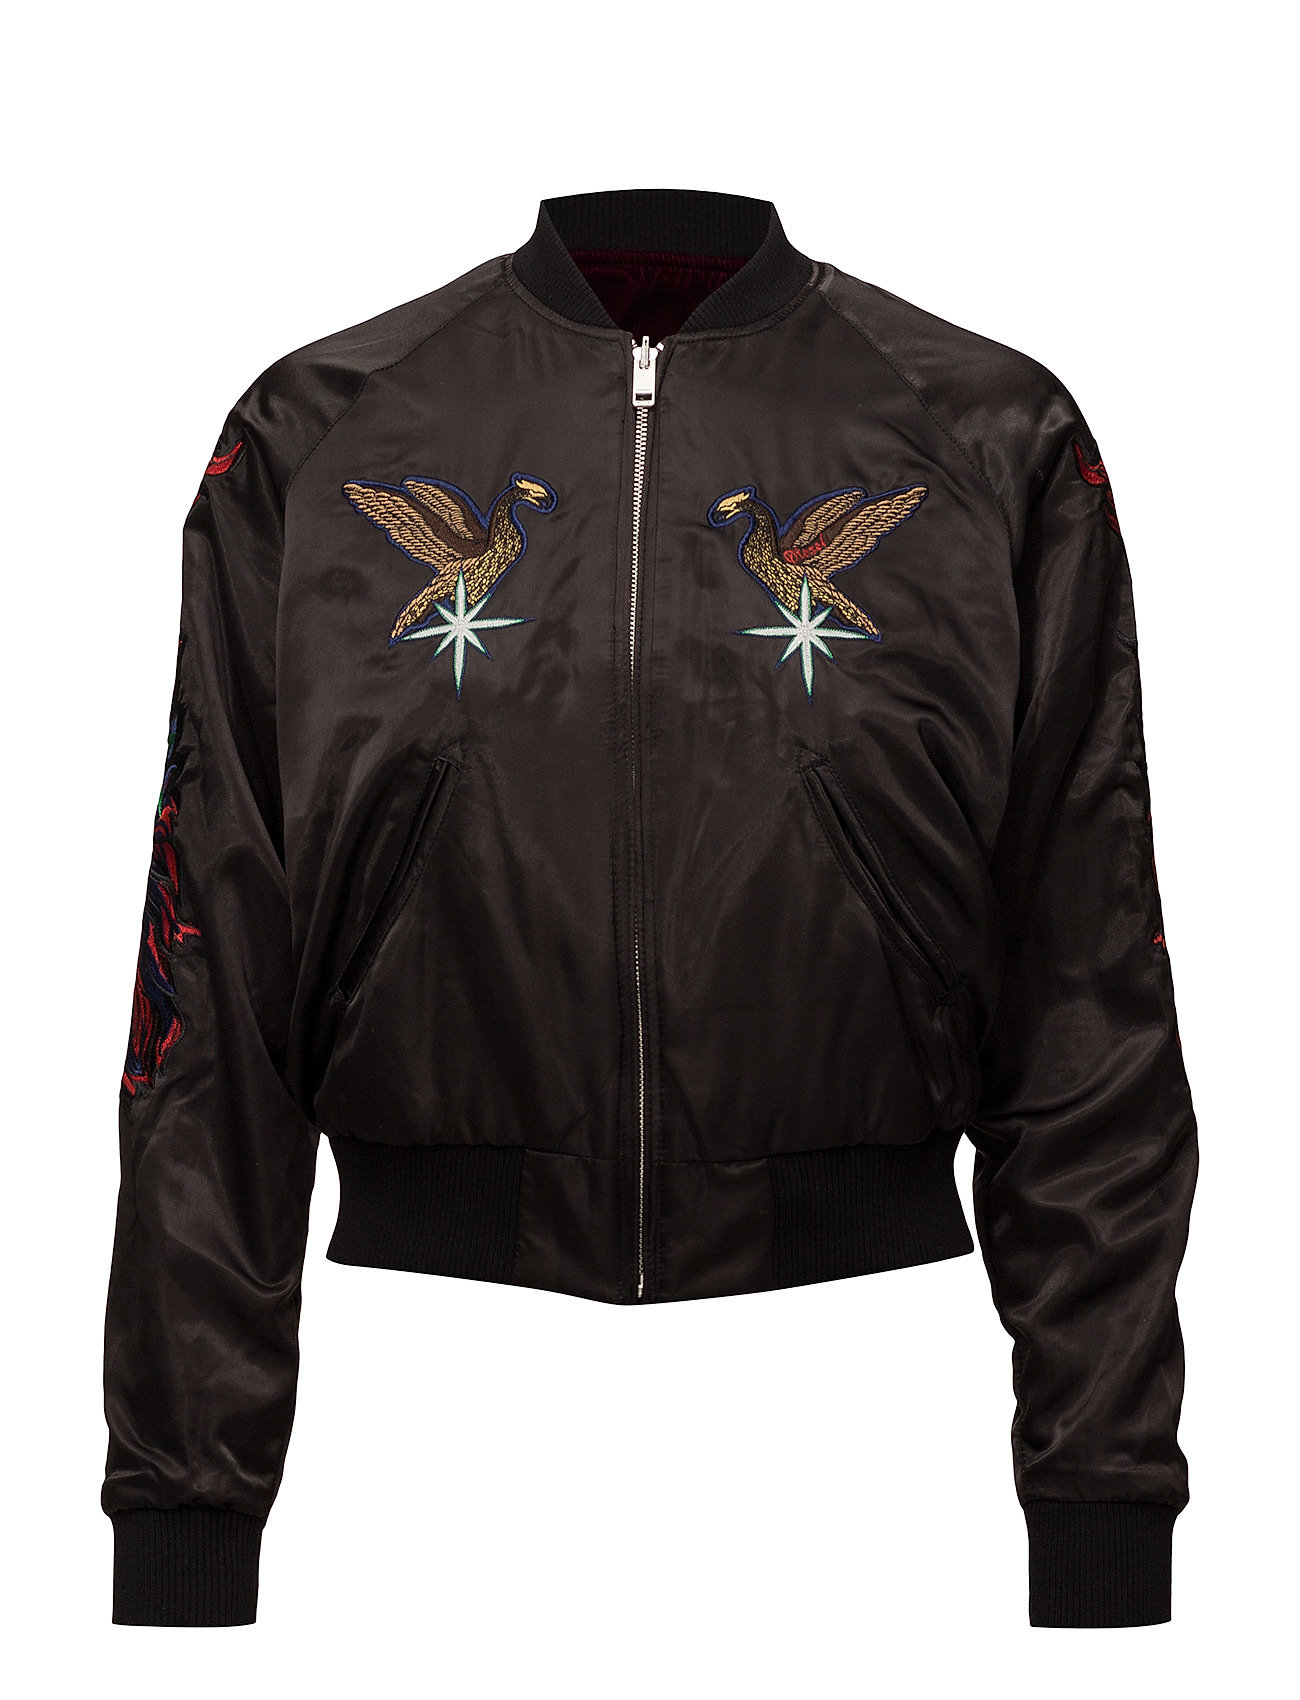 G-Absol-M Jacket